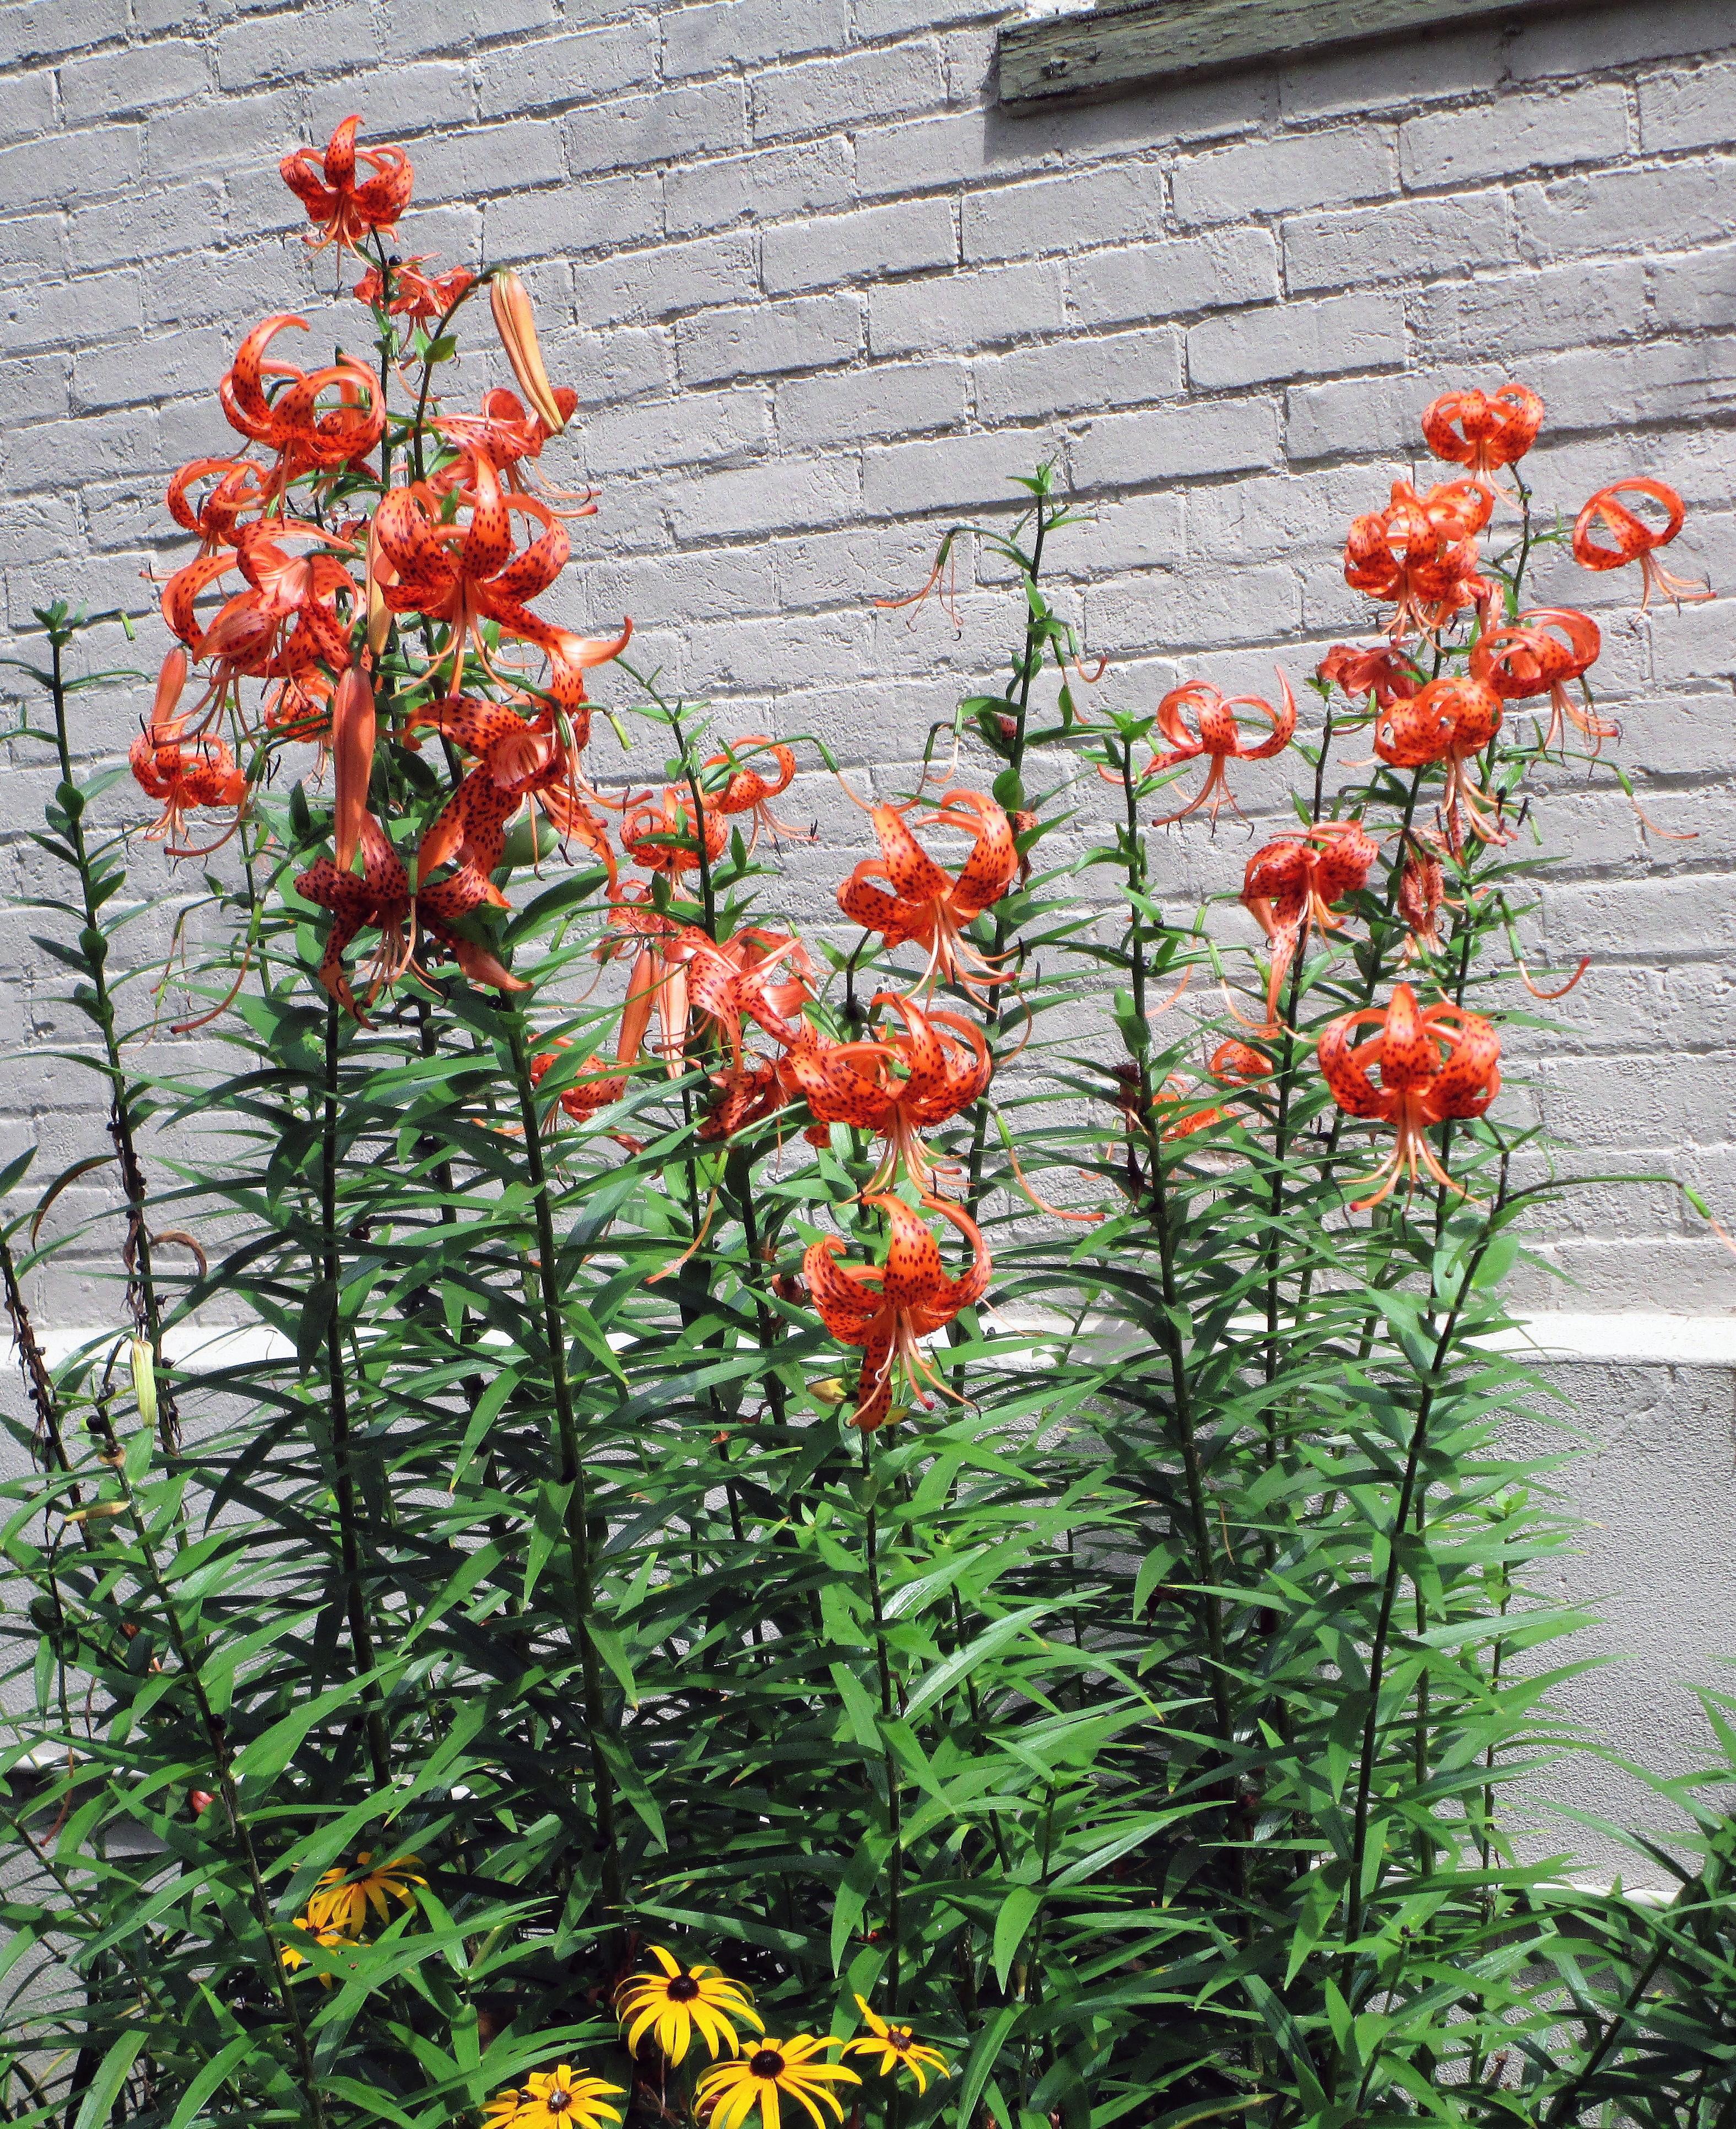 Turk's Cap Lillies